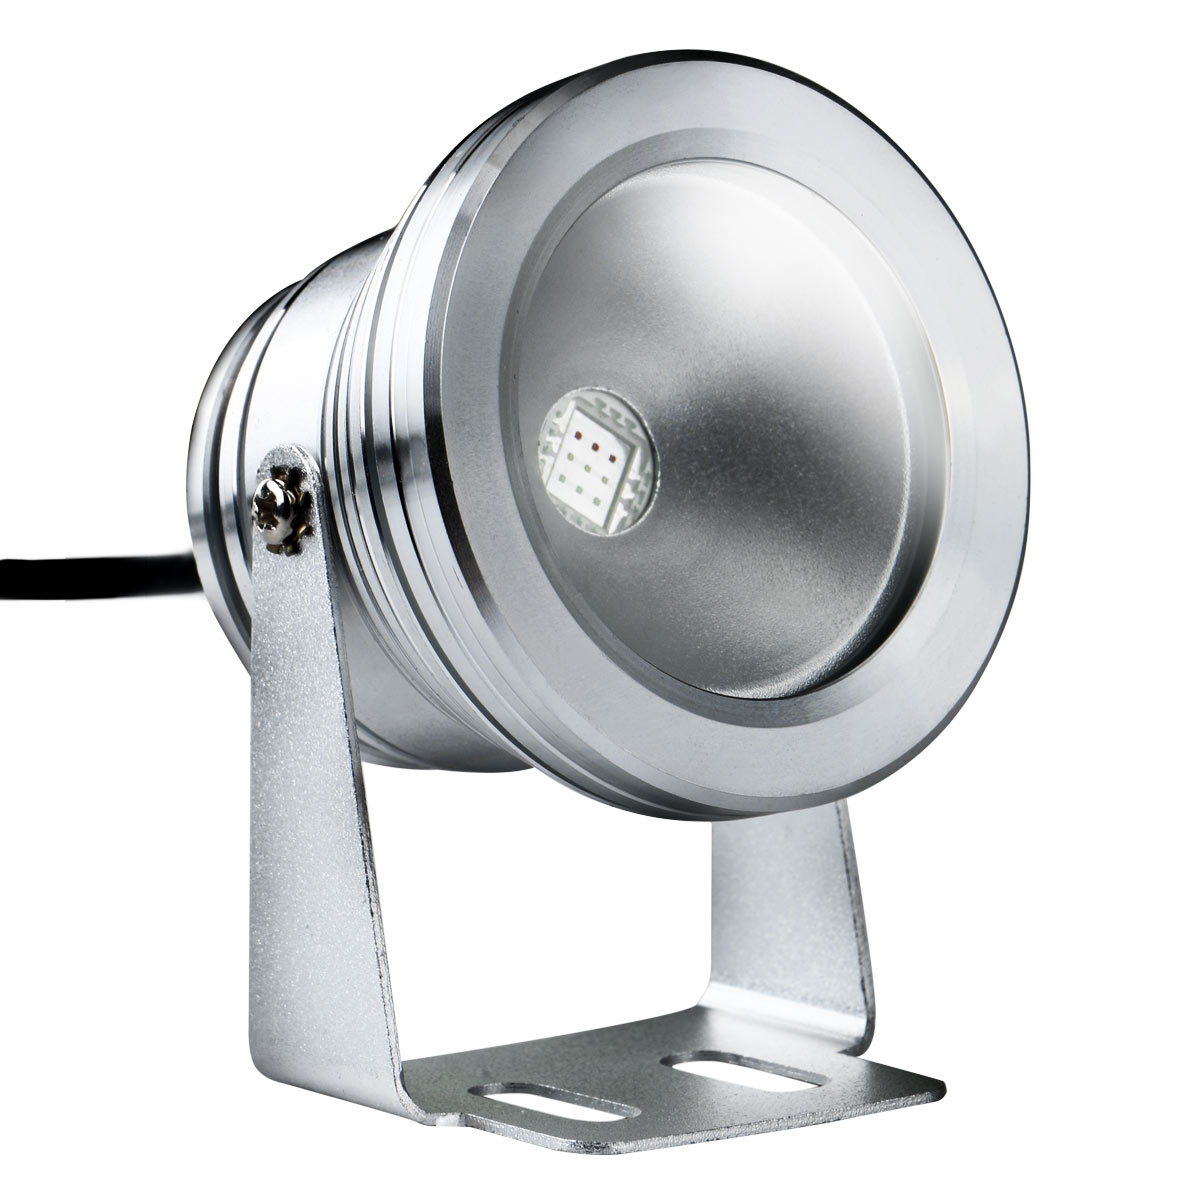 new 10w waterproof led flood spot light lamp 12v 85v 265v warm white white rgb. Black Bedroom Furniture Sets. Home Design Ideas